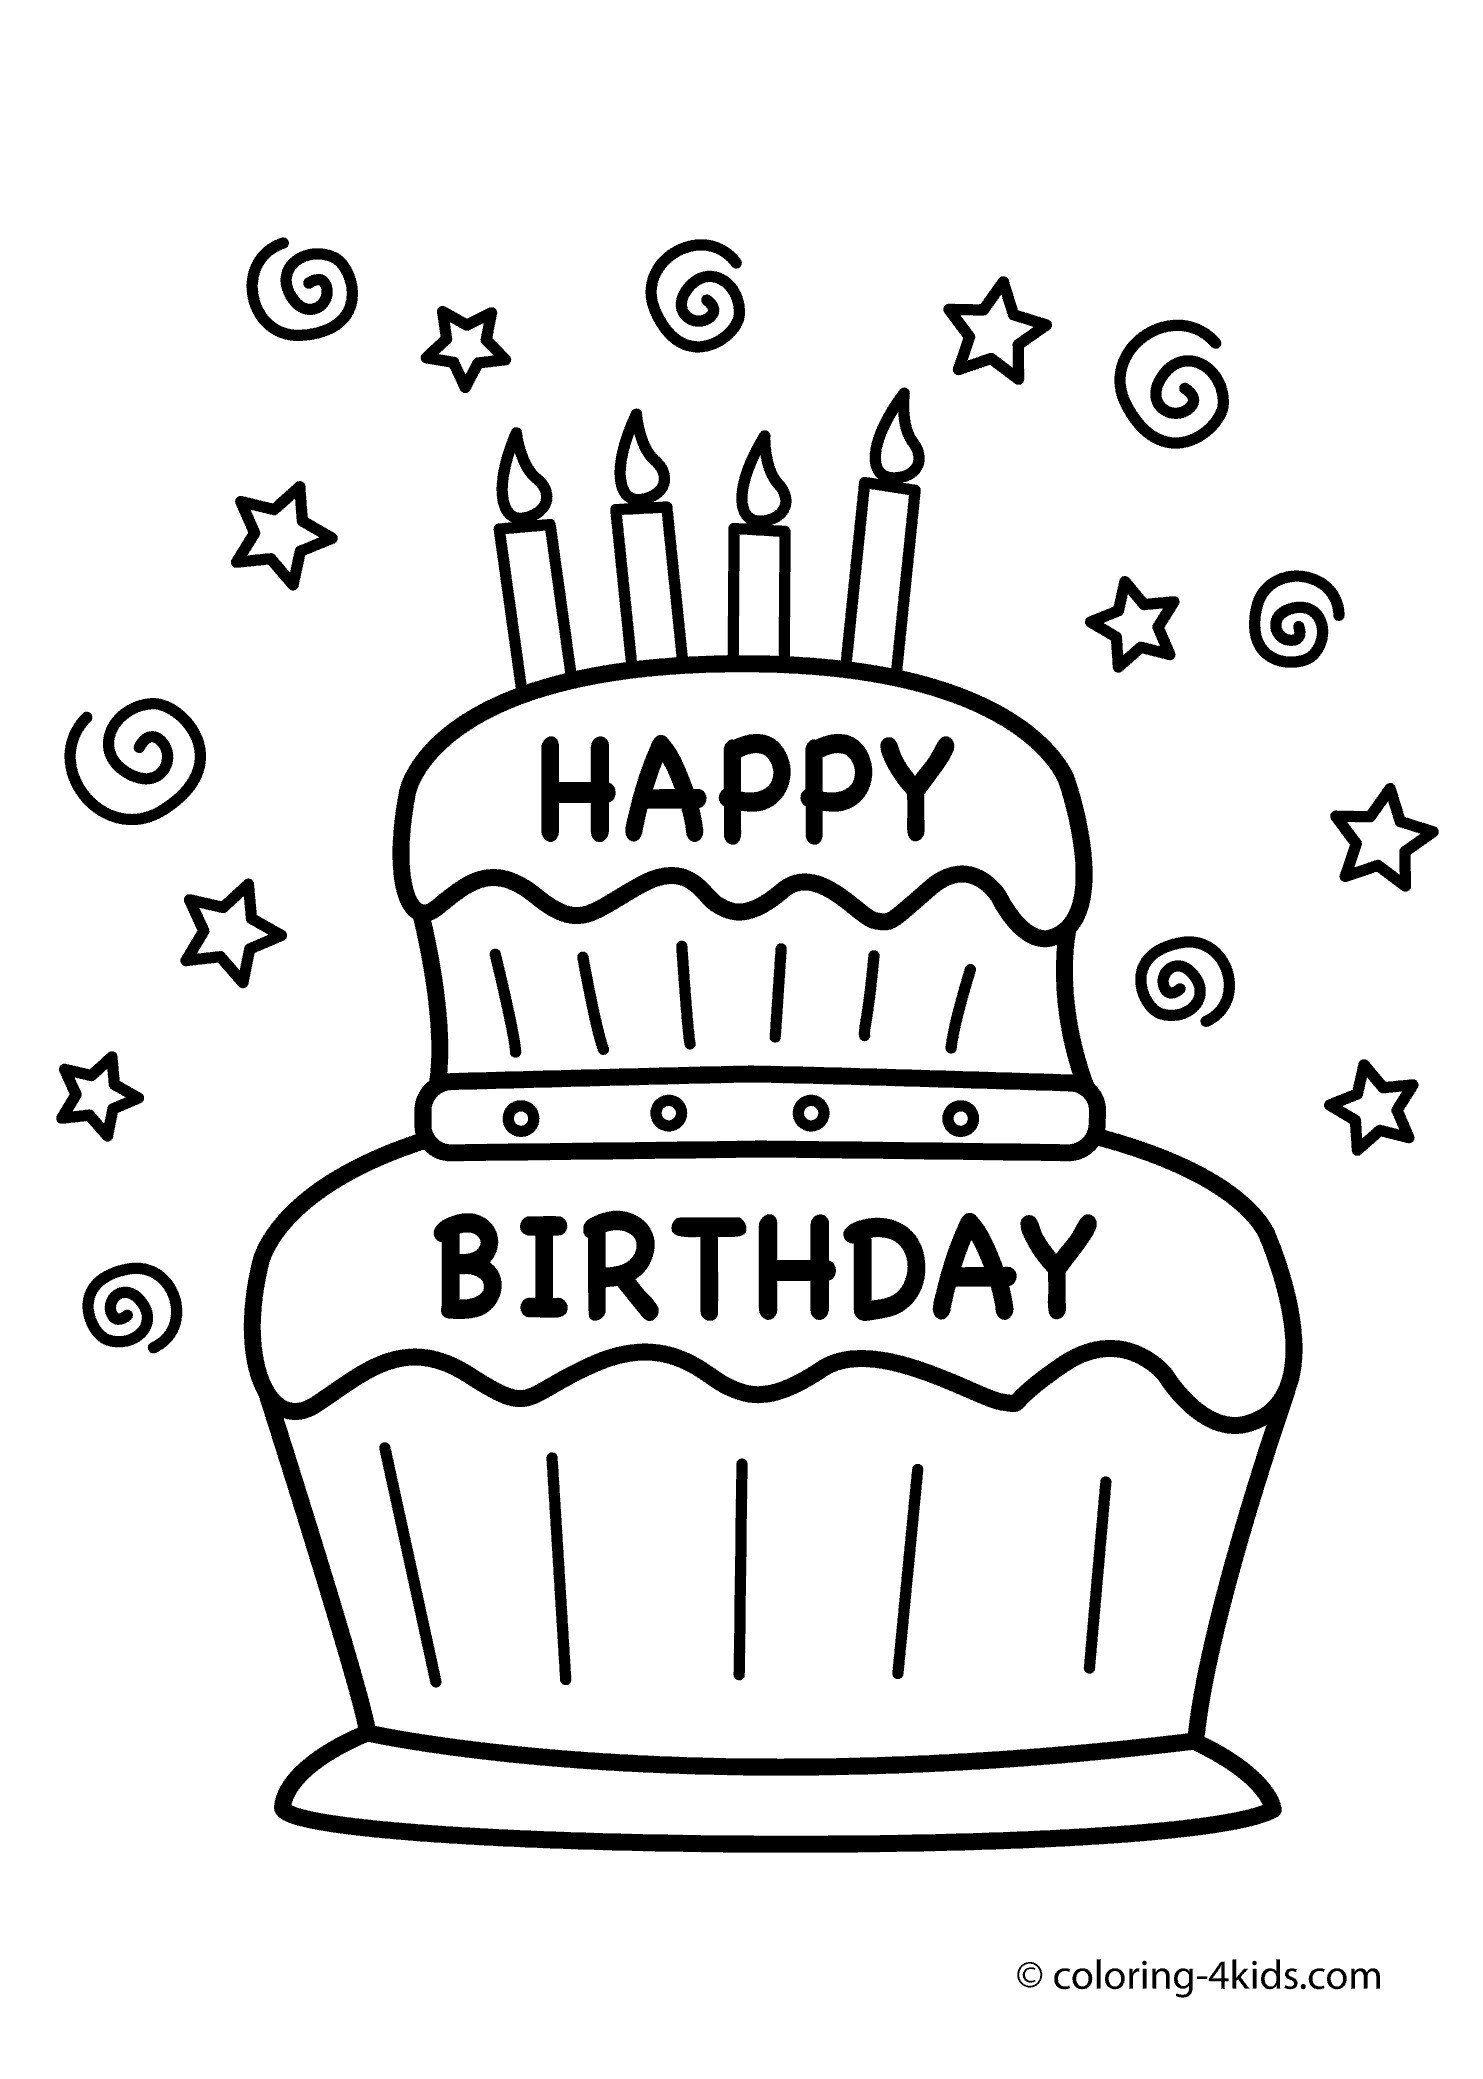 Birthday Cake Coloring Pages Printable Colouring Pages Birthday Cake And Candles Happy Birthday Coloring Pages Birthday Coloring Pages Happy Birthday Printable